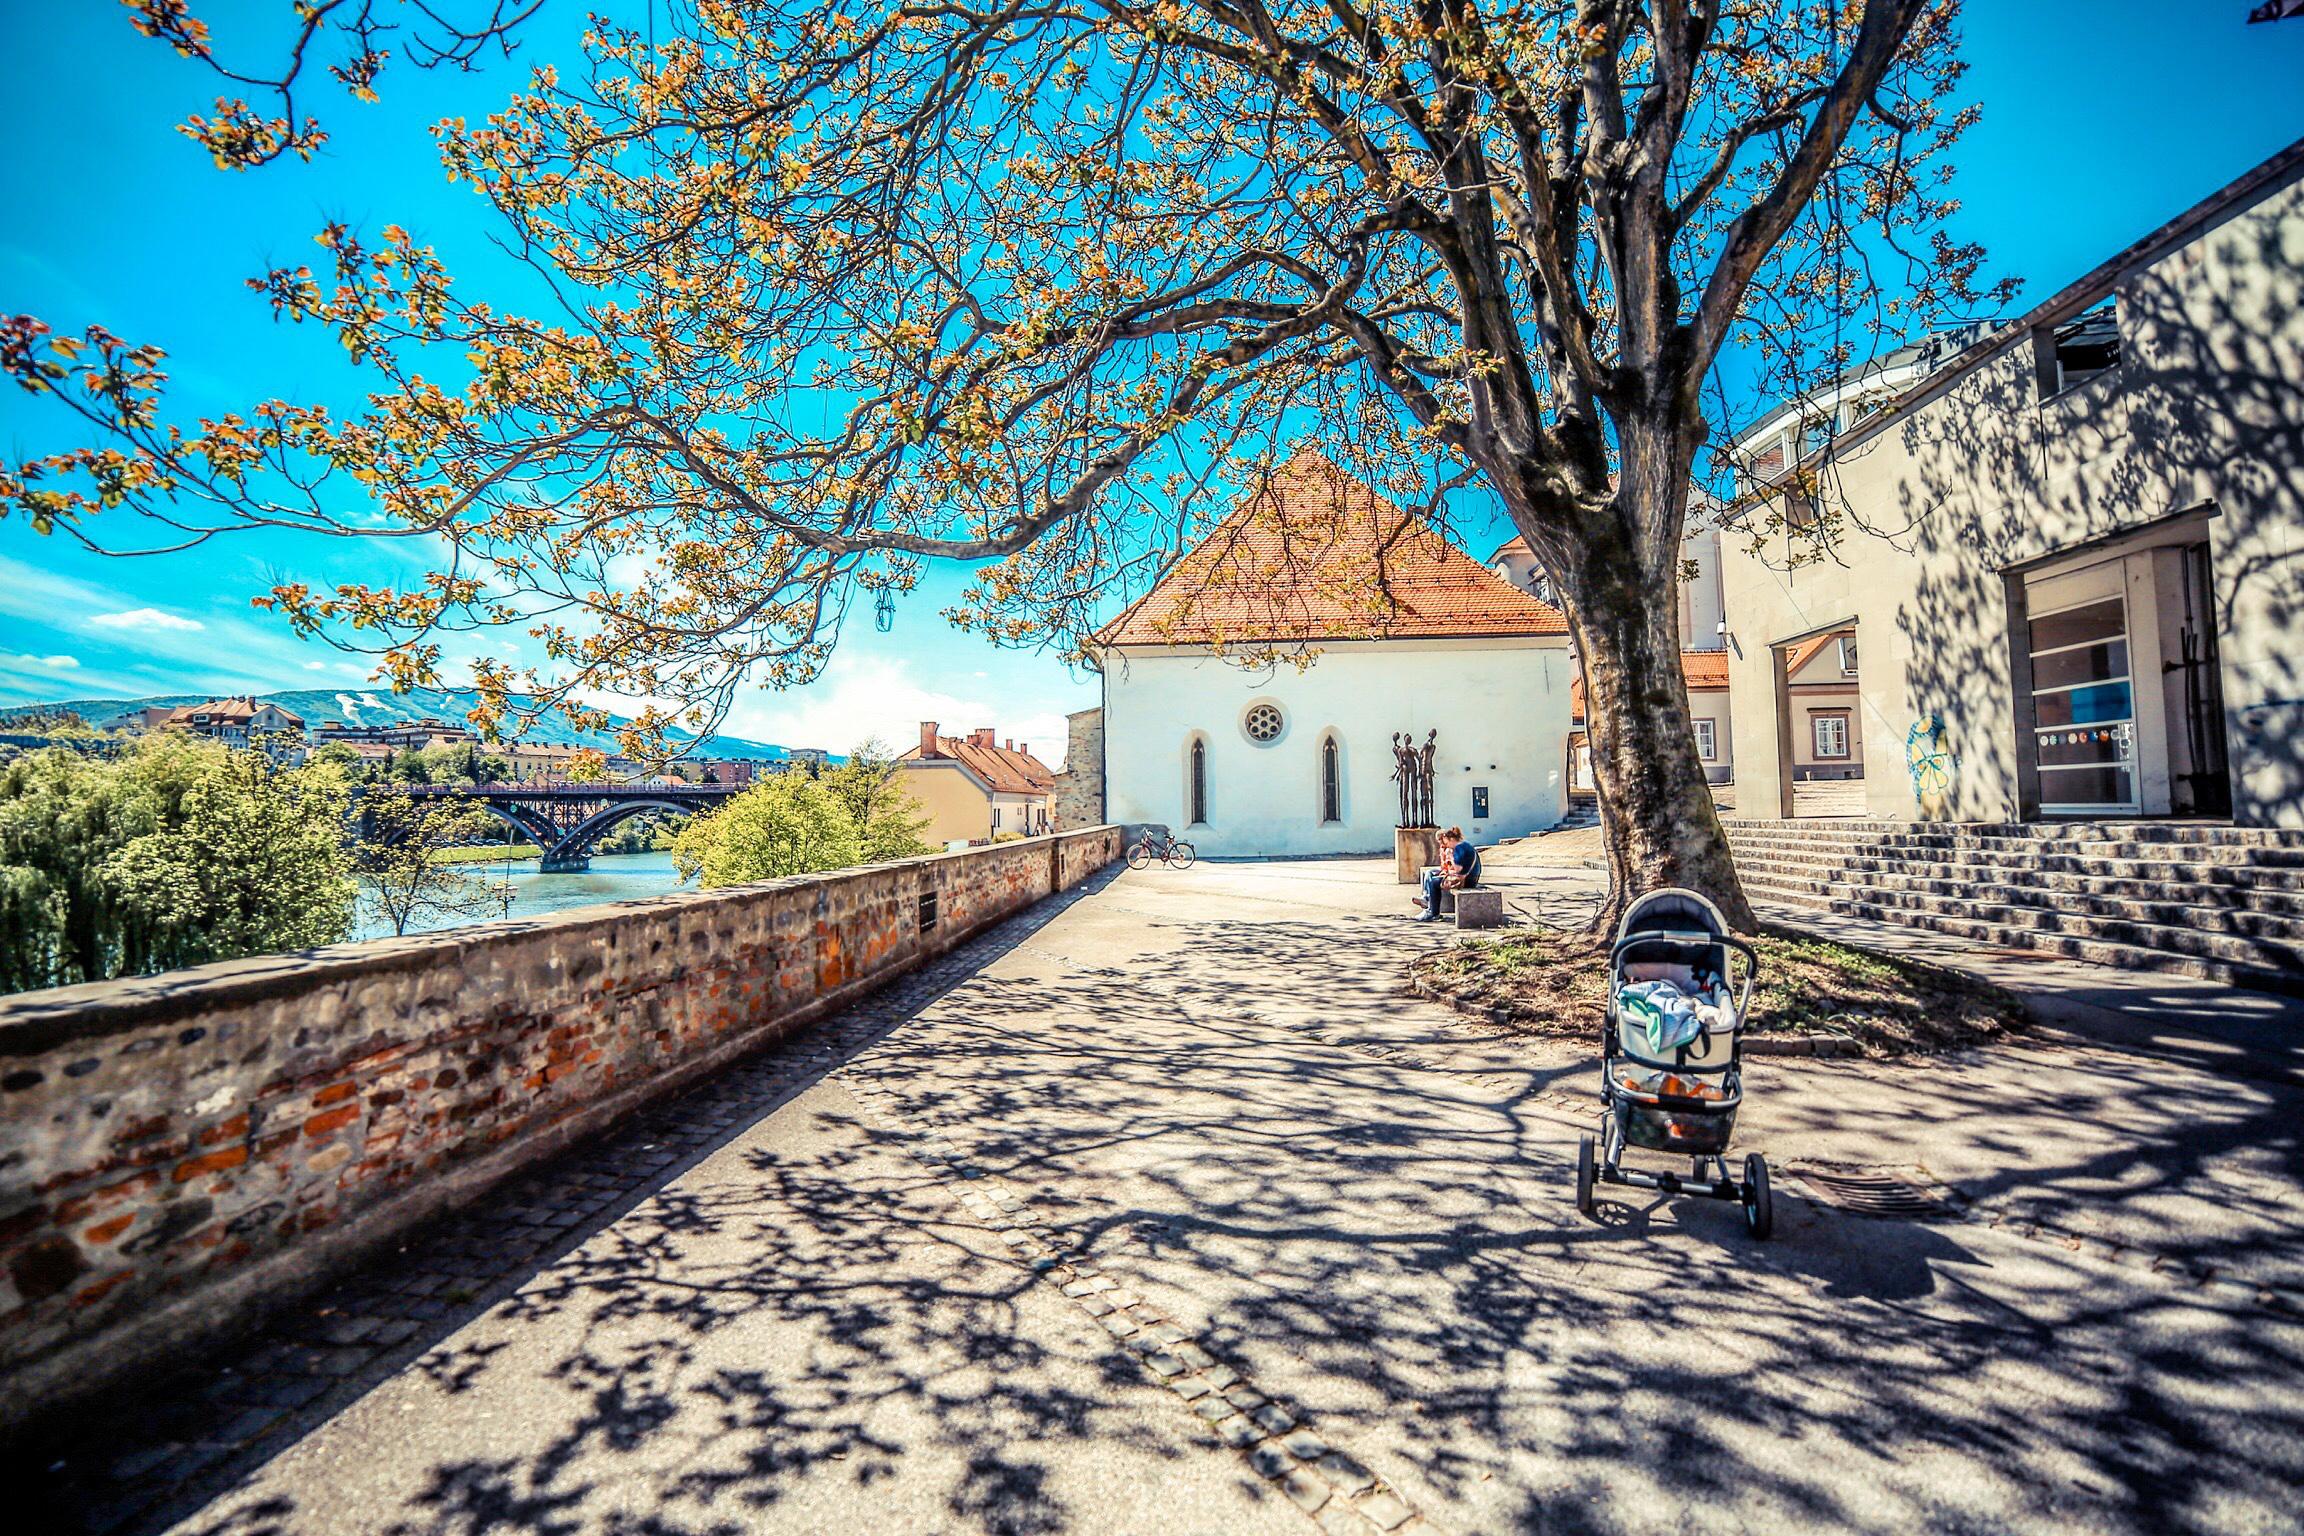 Pomladni_Maribor-19.jpg